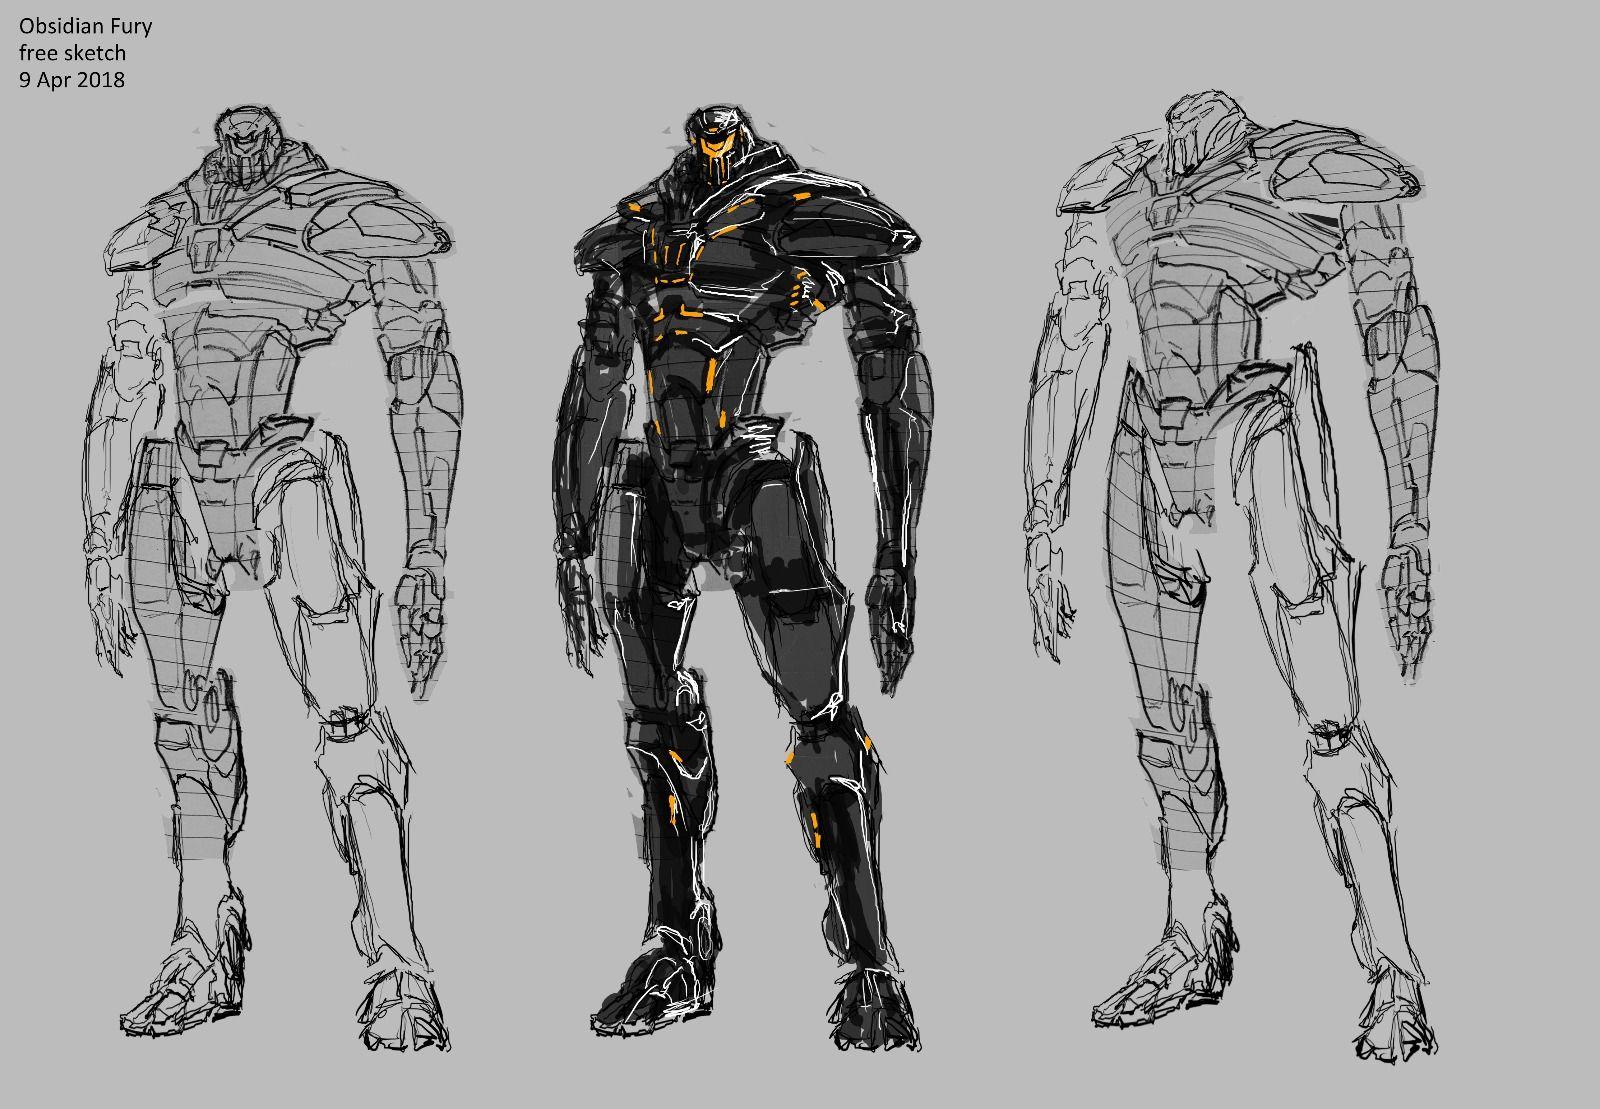 Obsidian Fury Free Sketch Restyle Pacific Rim 2 Uprising Titanes Del Pacifico Pacific Rim Arte Transformers